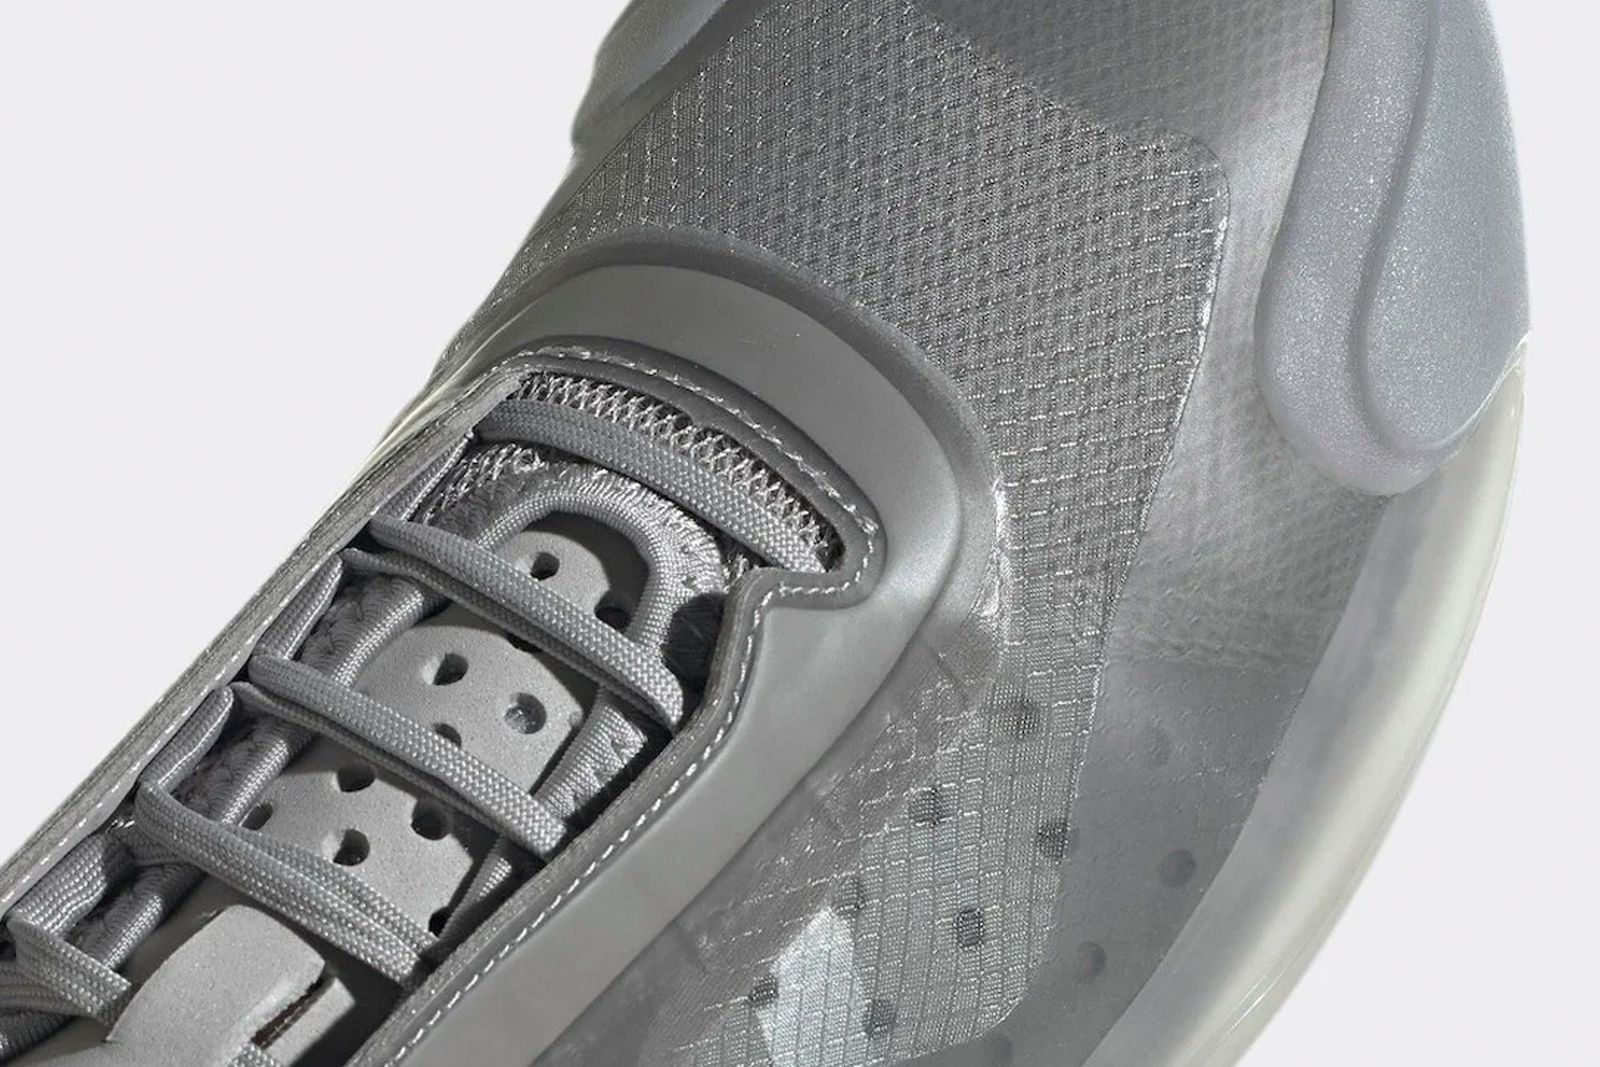 prada-adidas-luna-rossa-21-silver-release-date-price-05